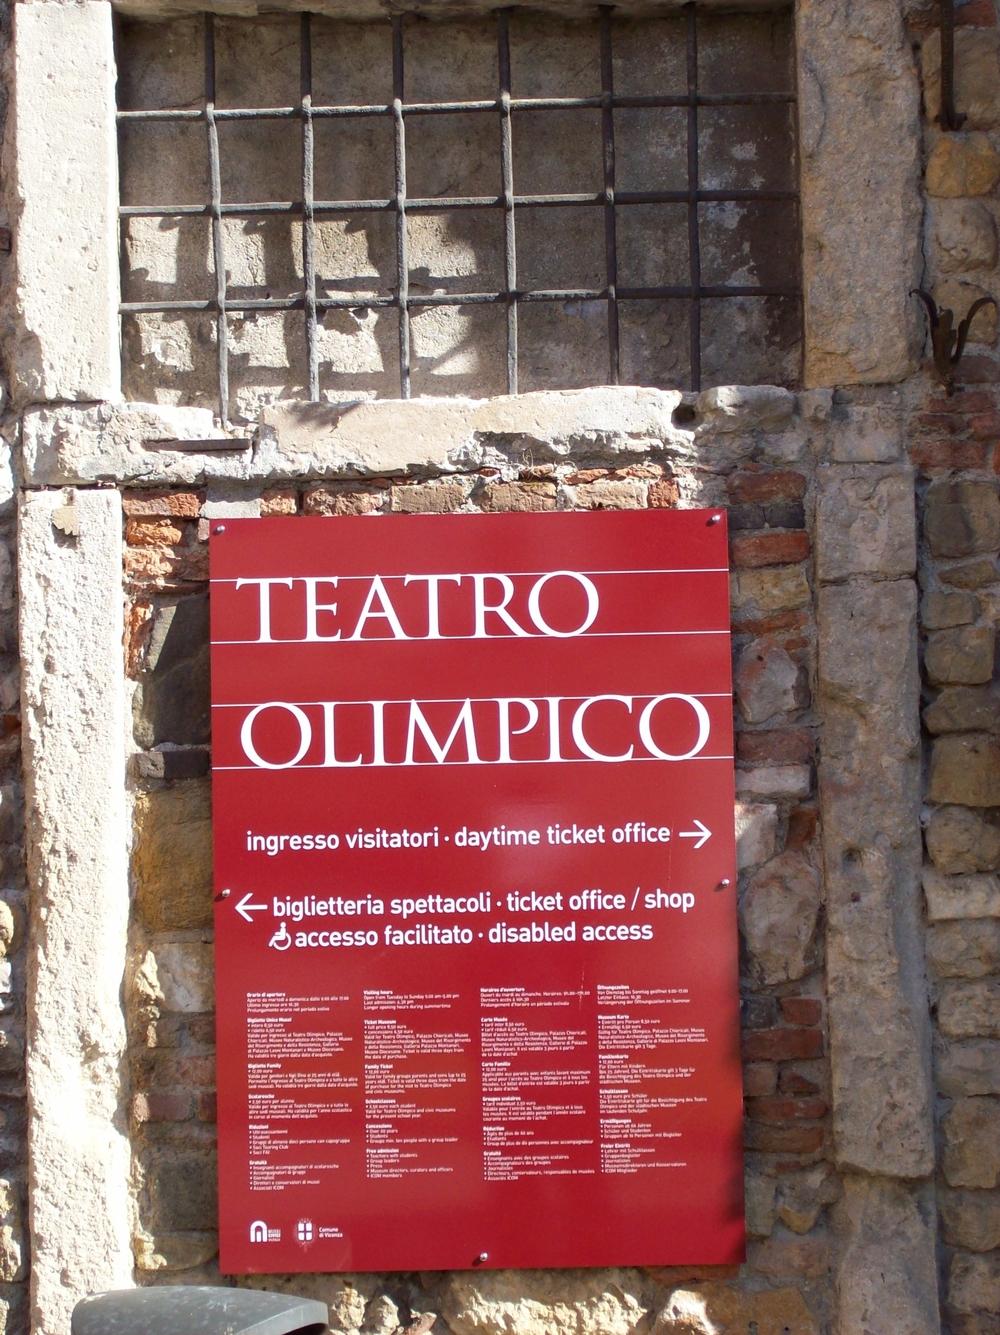 CRO Italy web 2011 - 09.JPG